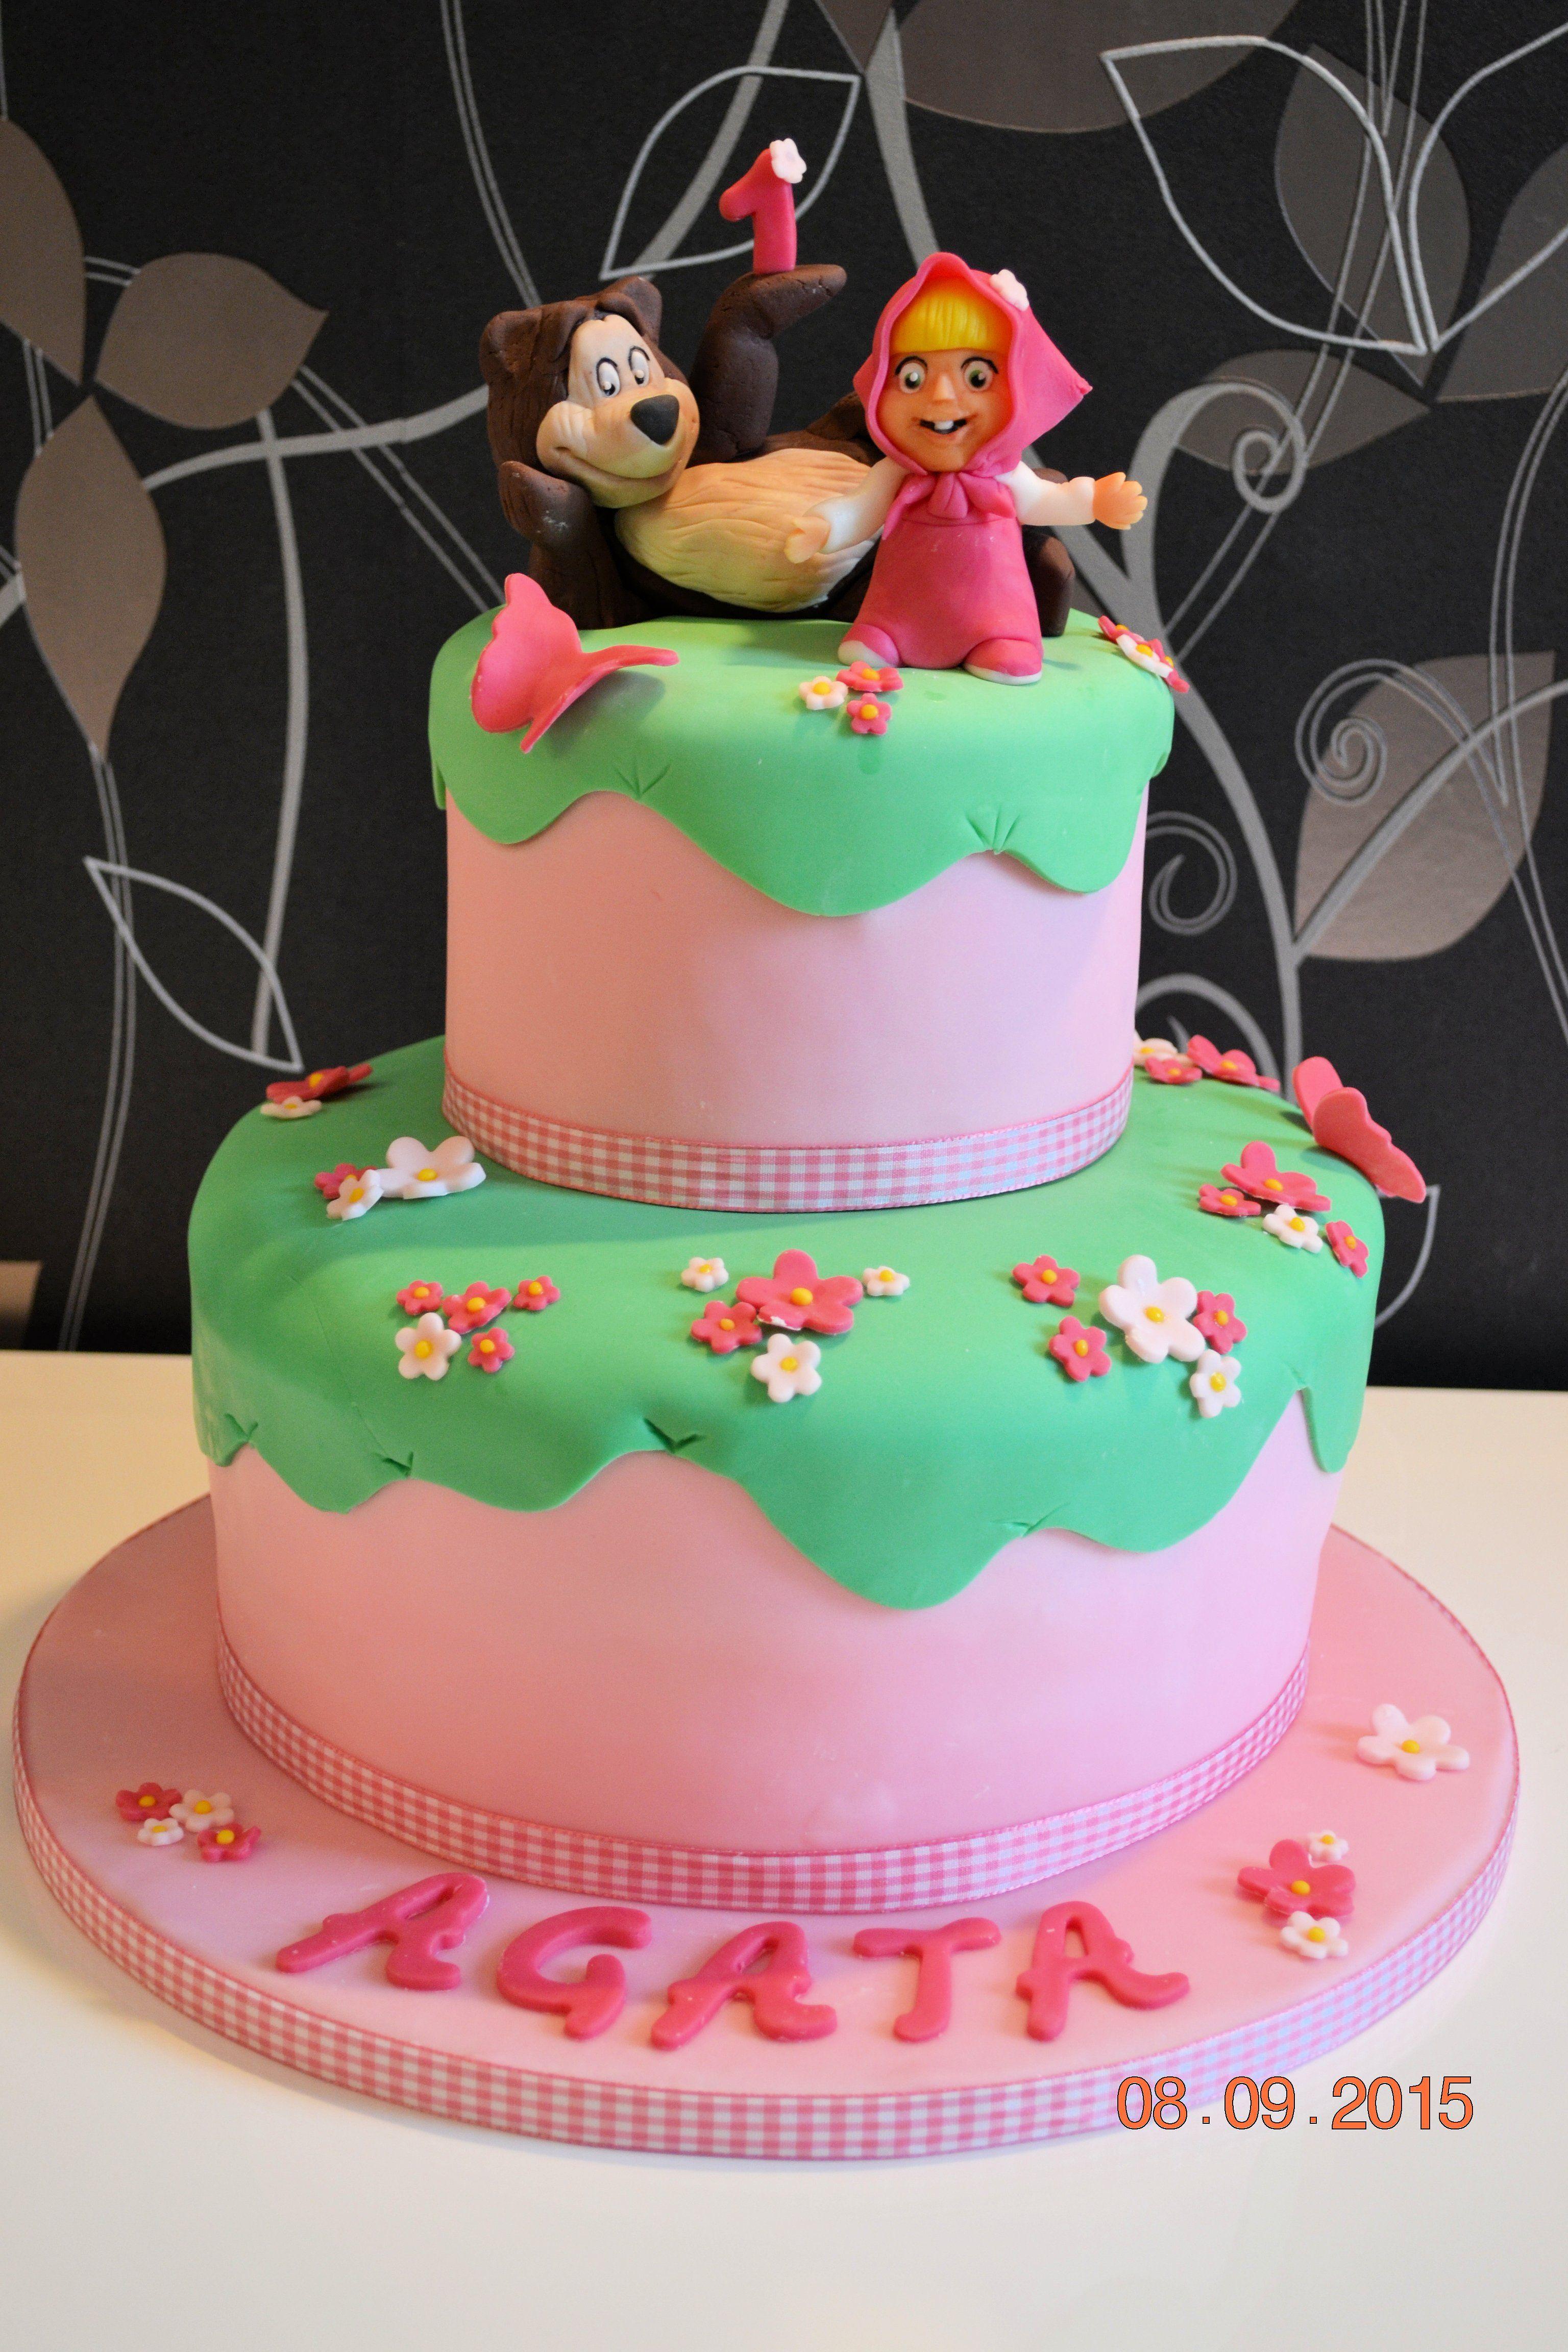 Masha And The Bear Birthday Cake My Cakes Pinterest Birthday - Bear birthday cake